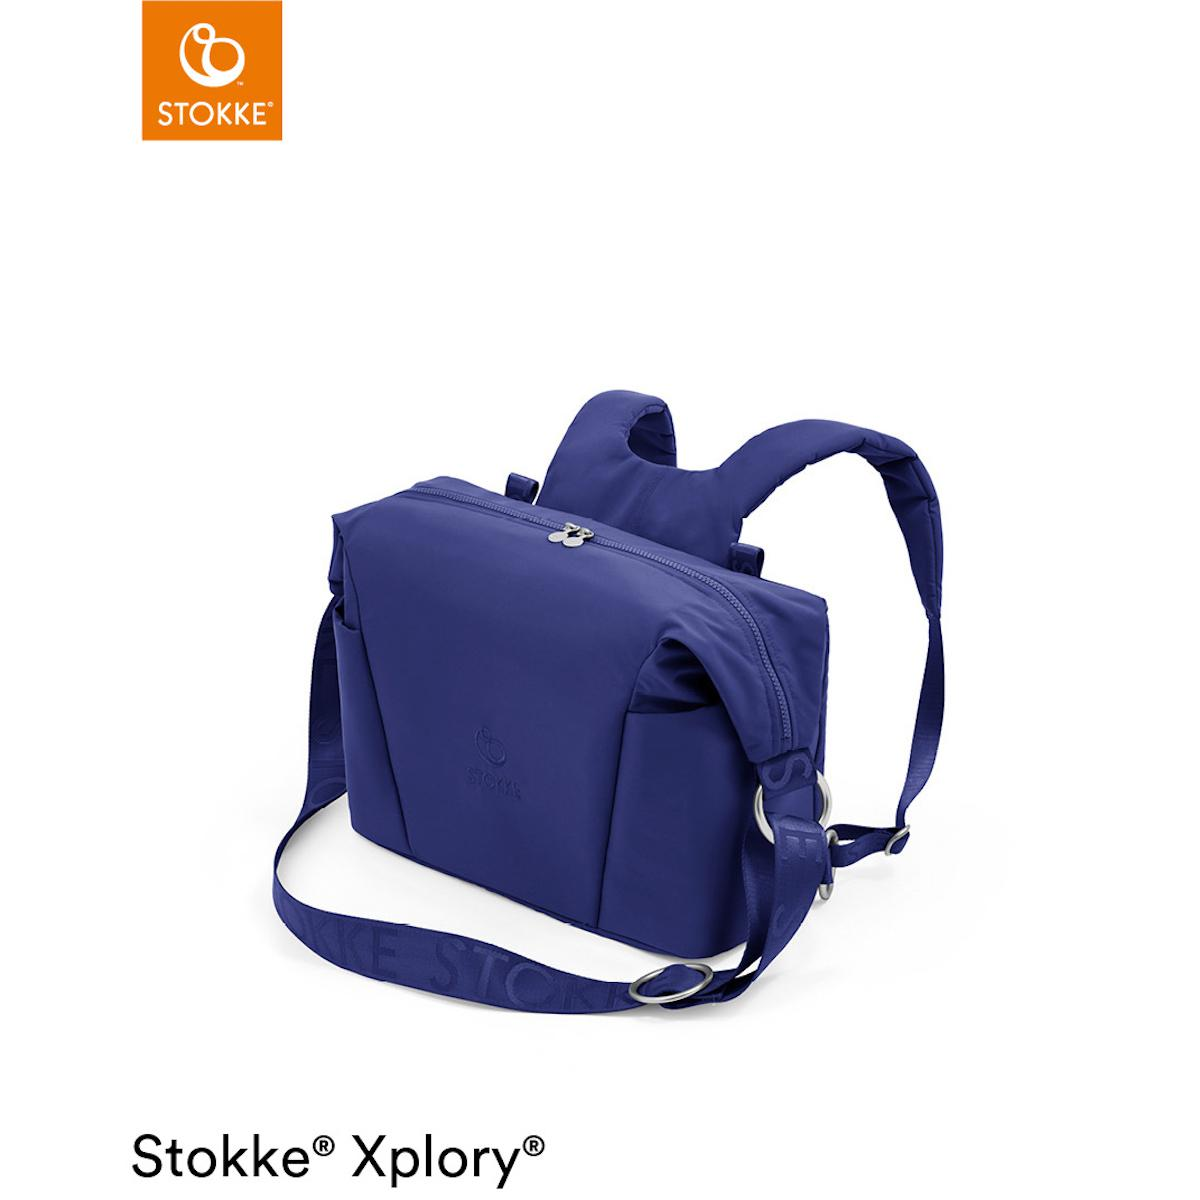 Sac à langer XPLORY X Stokke Royal Blue